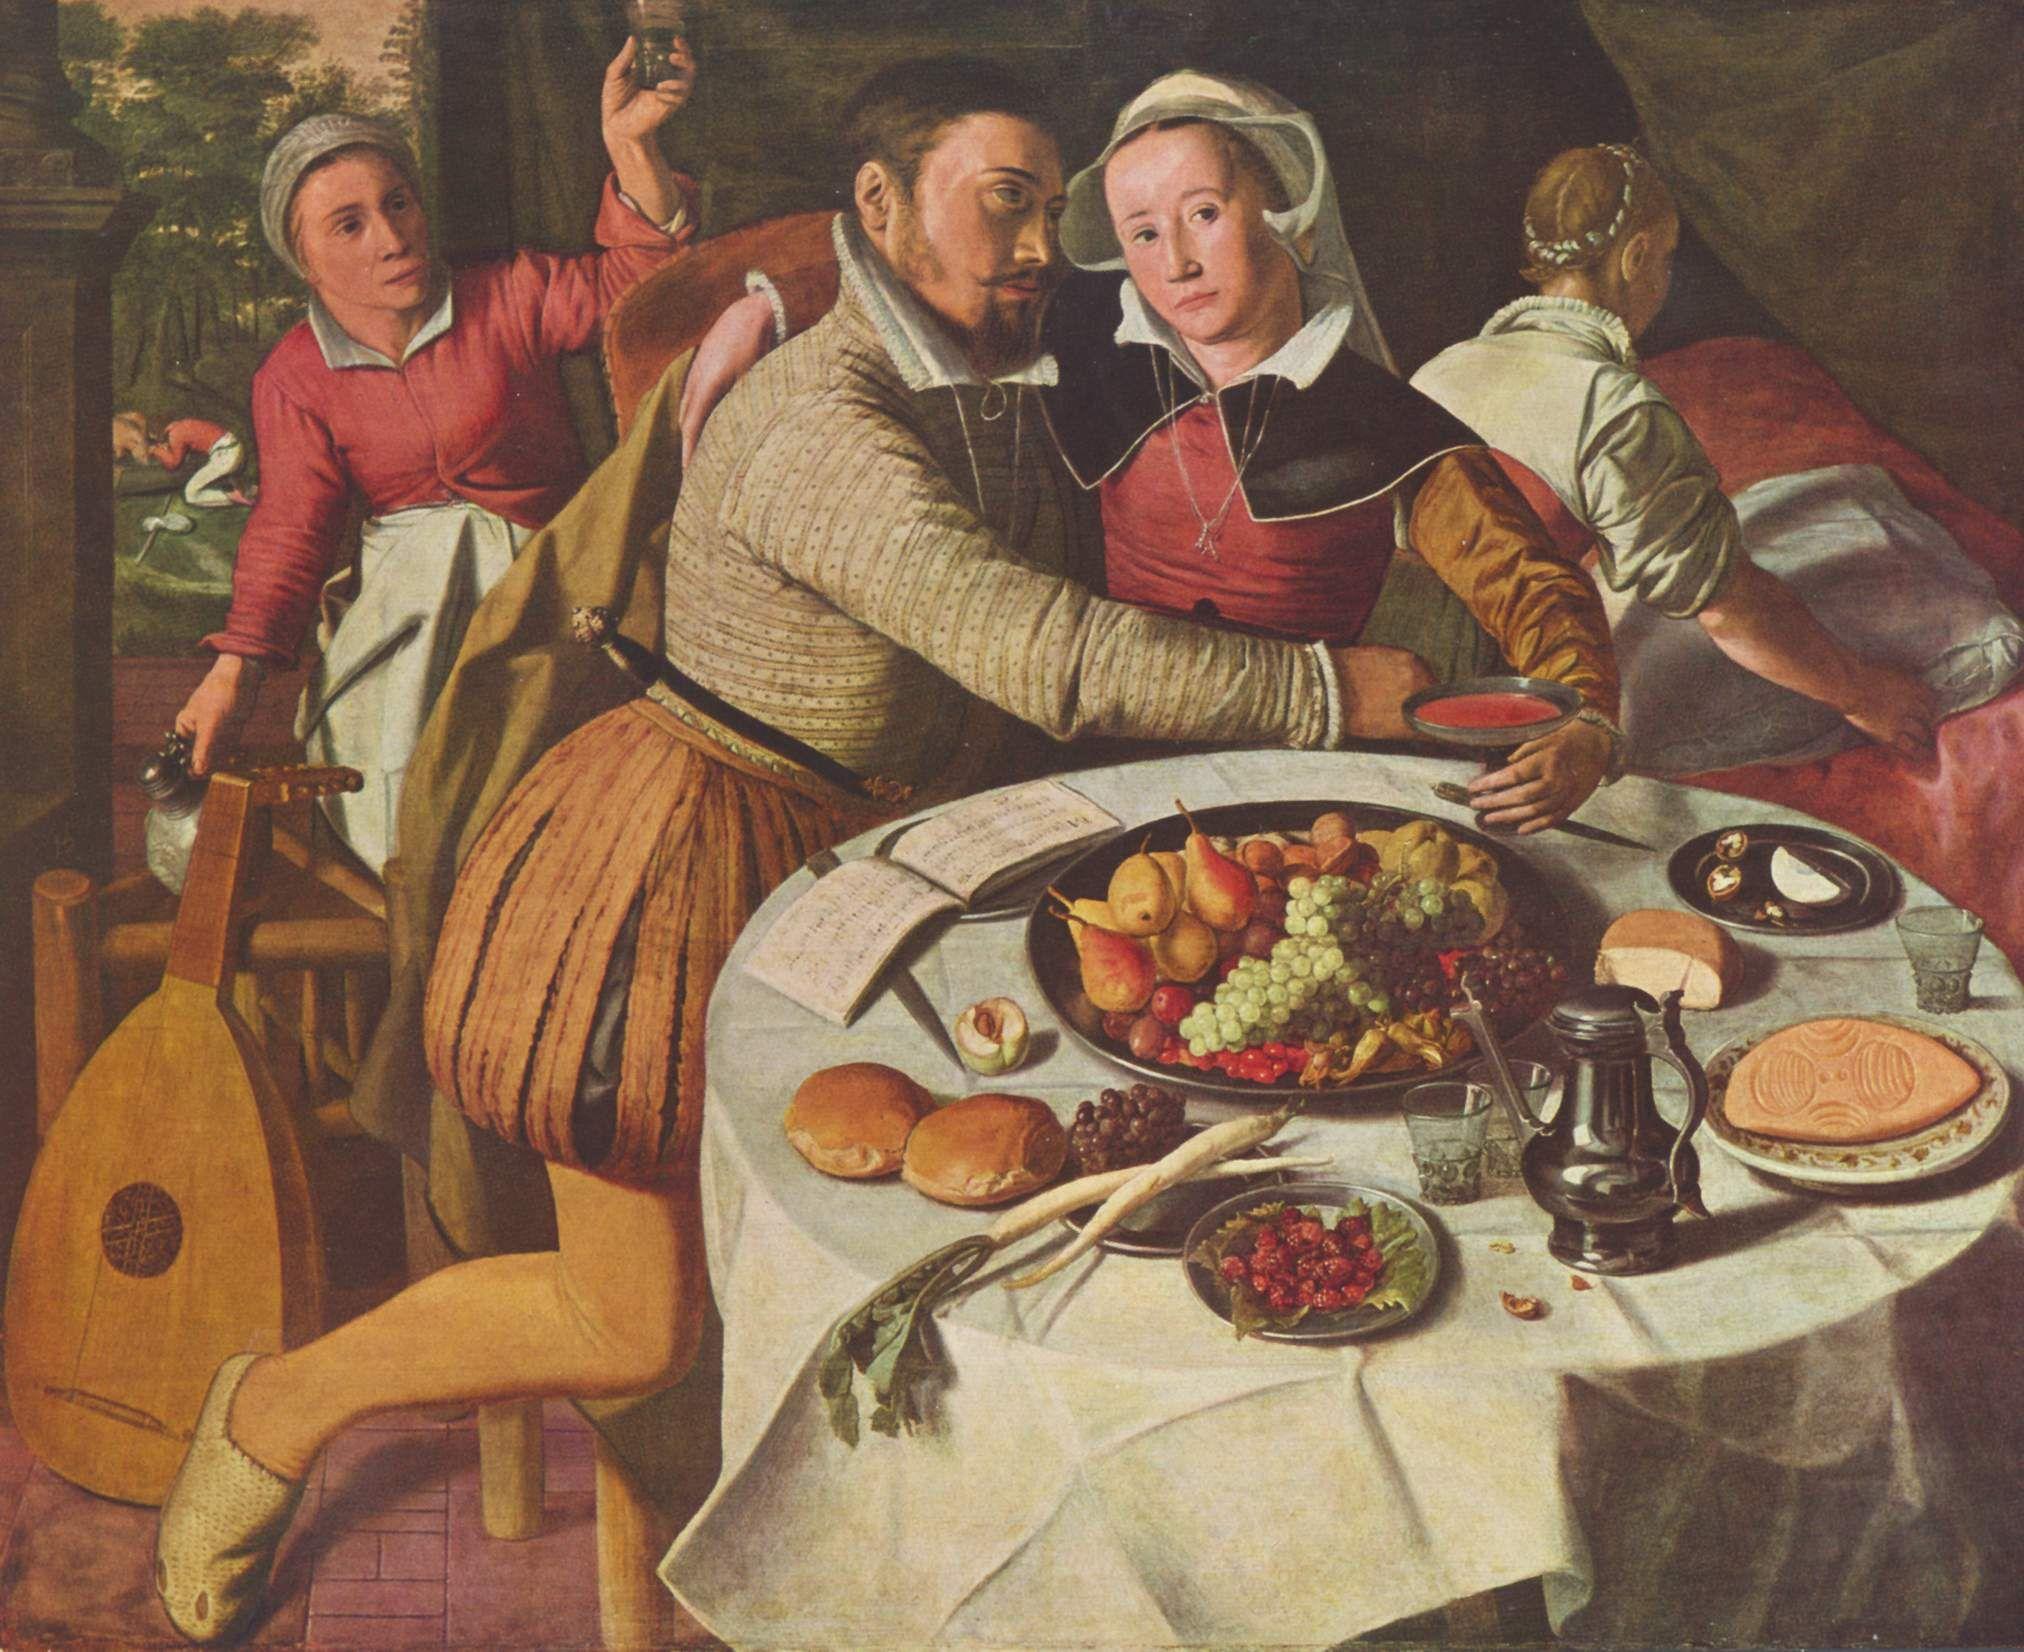 artist monogrammist hb title deutsch der verlorene sohn date between 1525 and 1550 medium oil. Black Bedroom Furniture Sets. Home Design Ideas